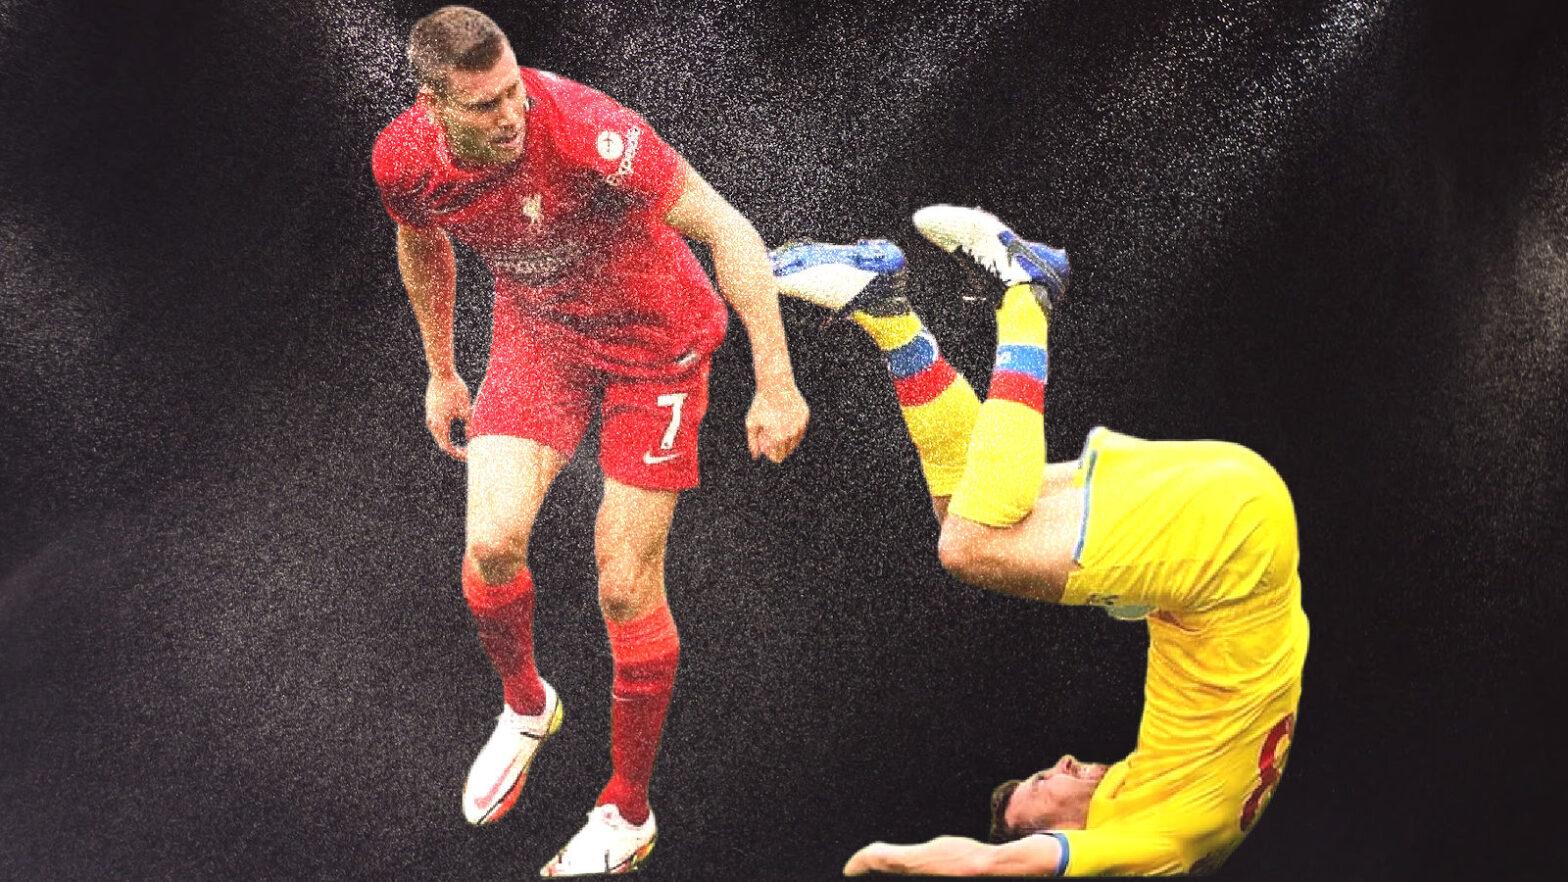 James Milner against Crystal Palace